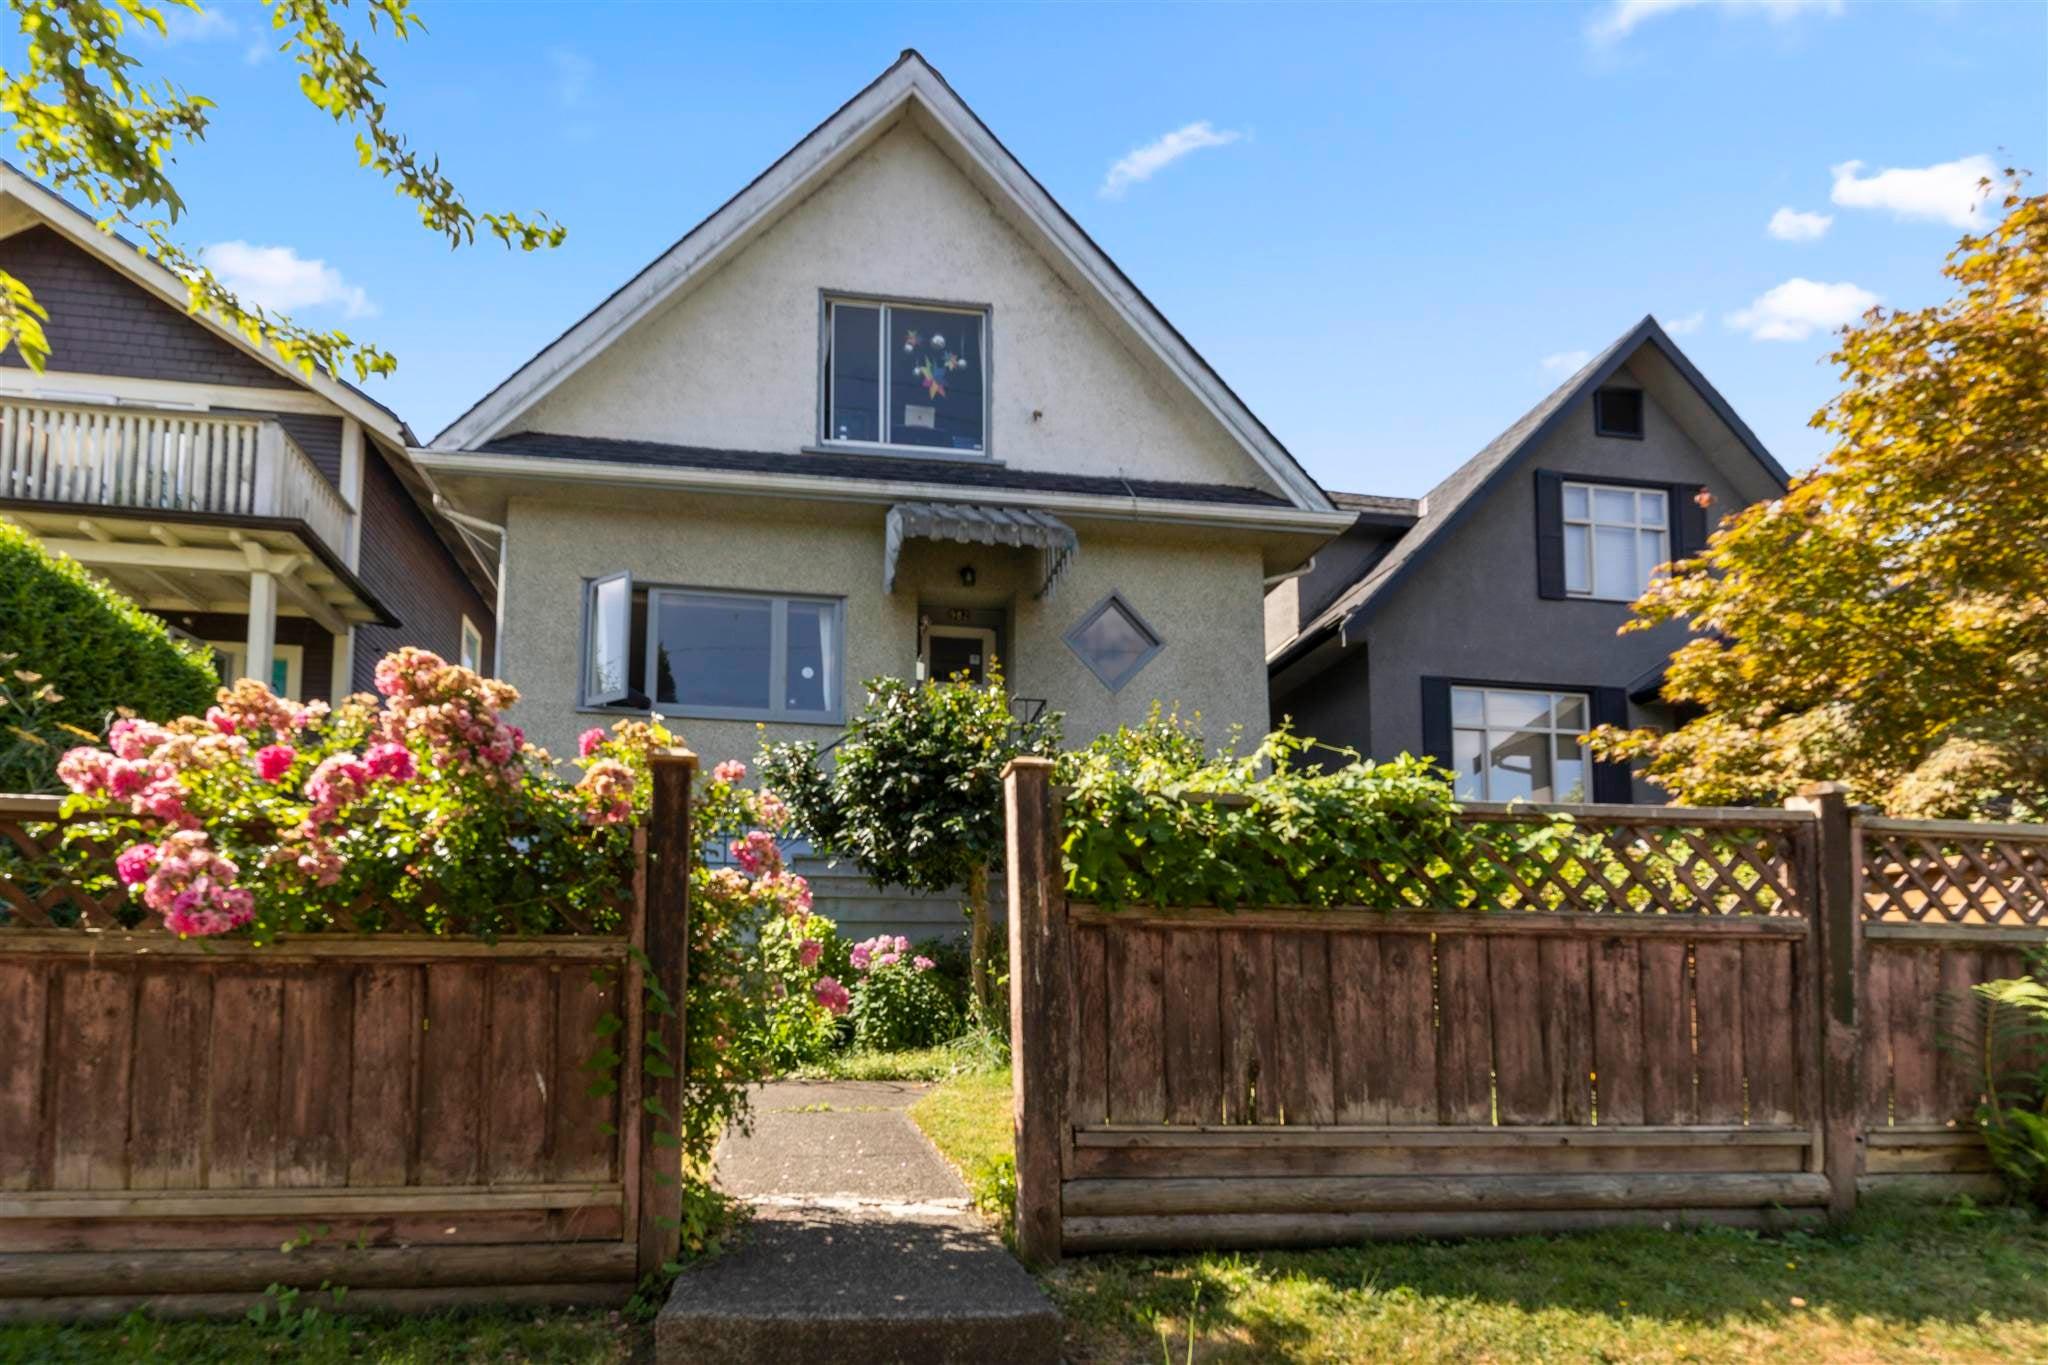 982 E 28TH AVENUE - Fraser VE House/Single Family for sale, 5 Bedrooms (R2604655) - #1